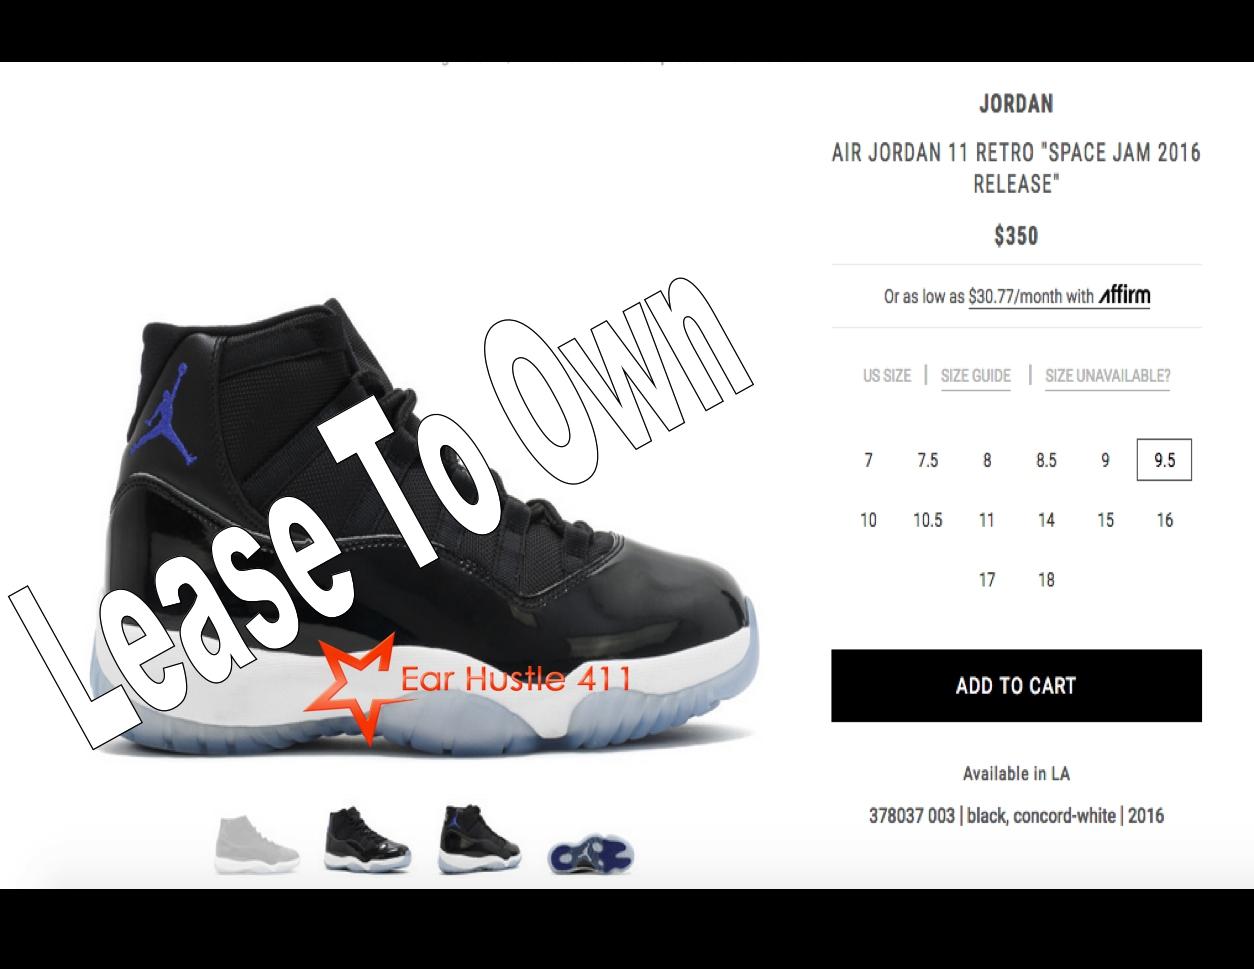 cheap jordan shoes $300 loan in one hour 756706